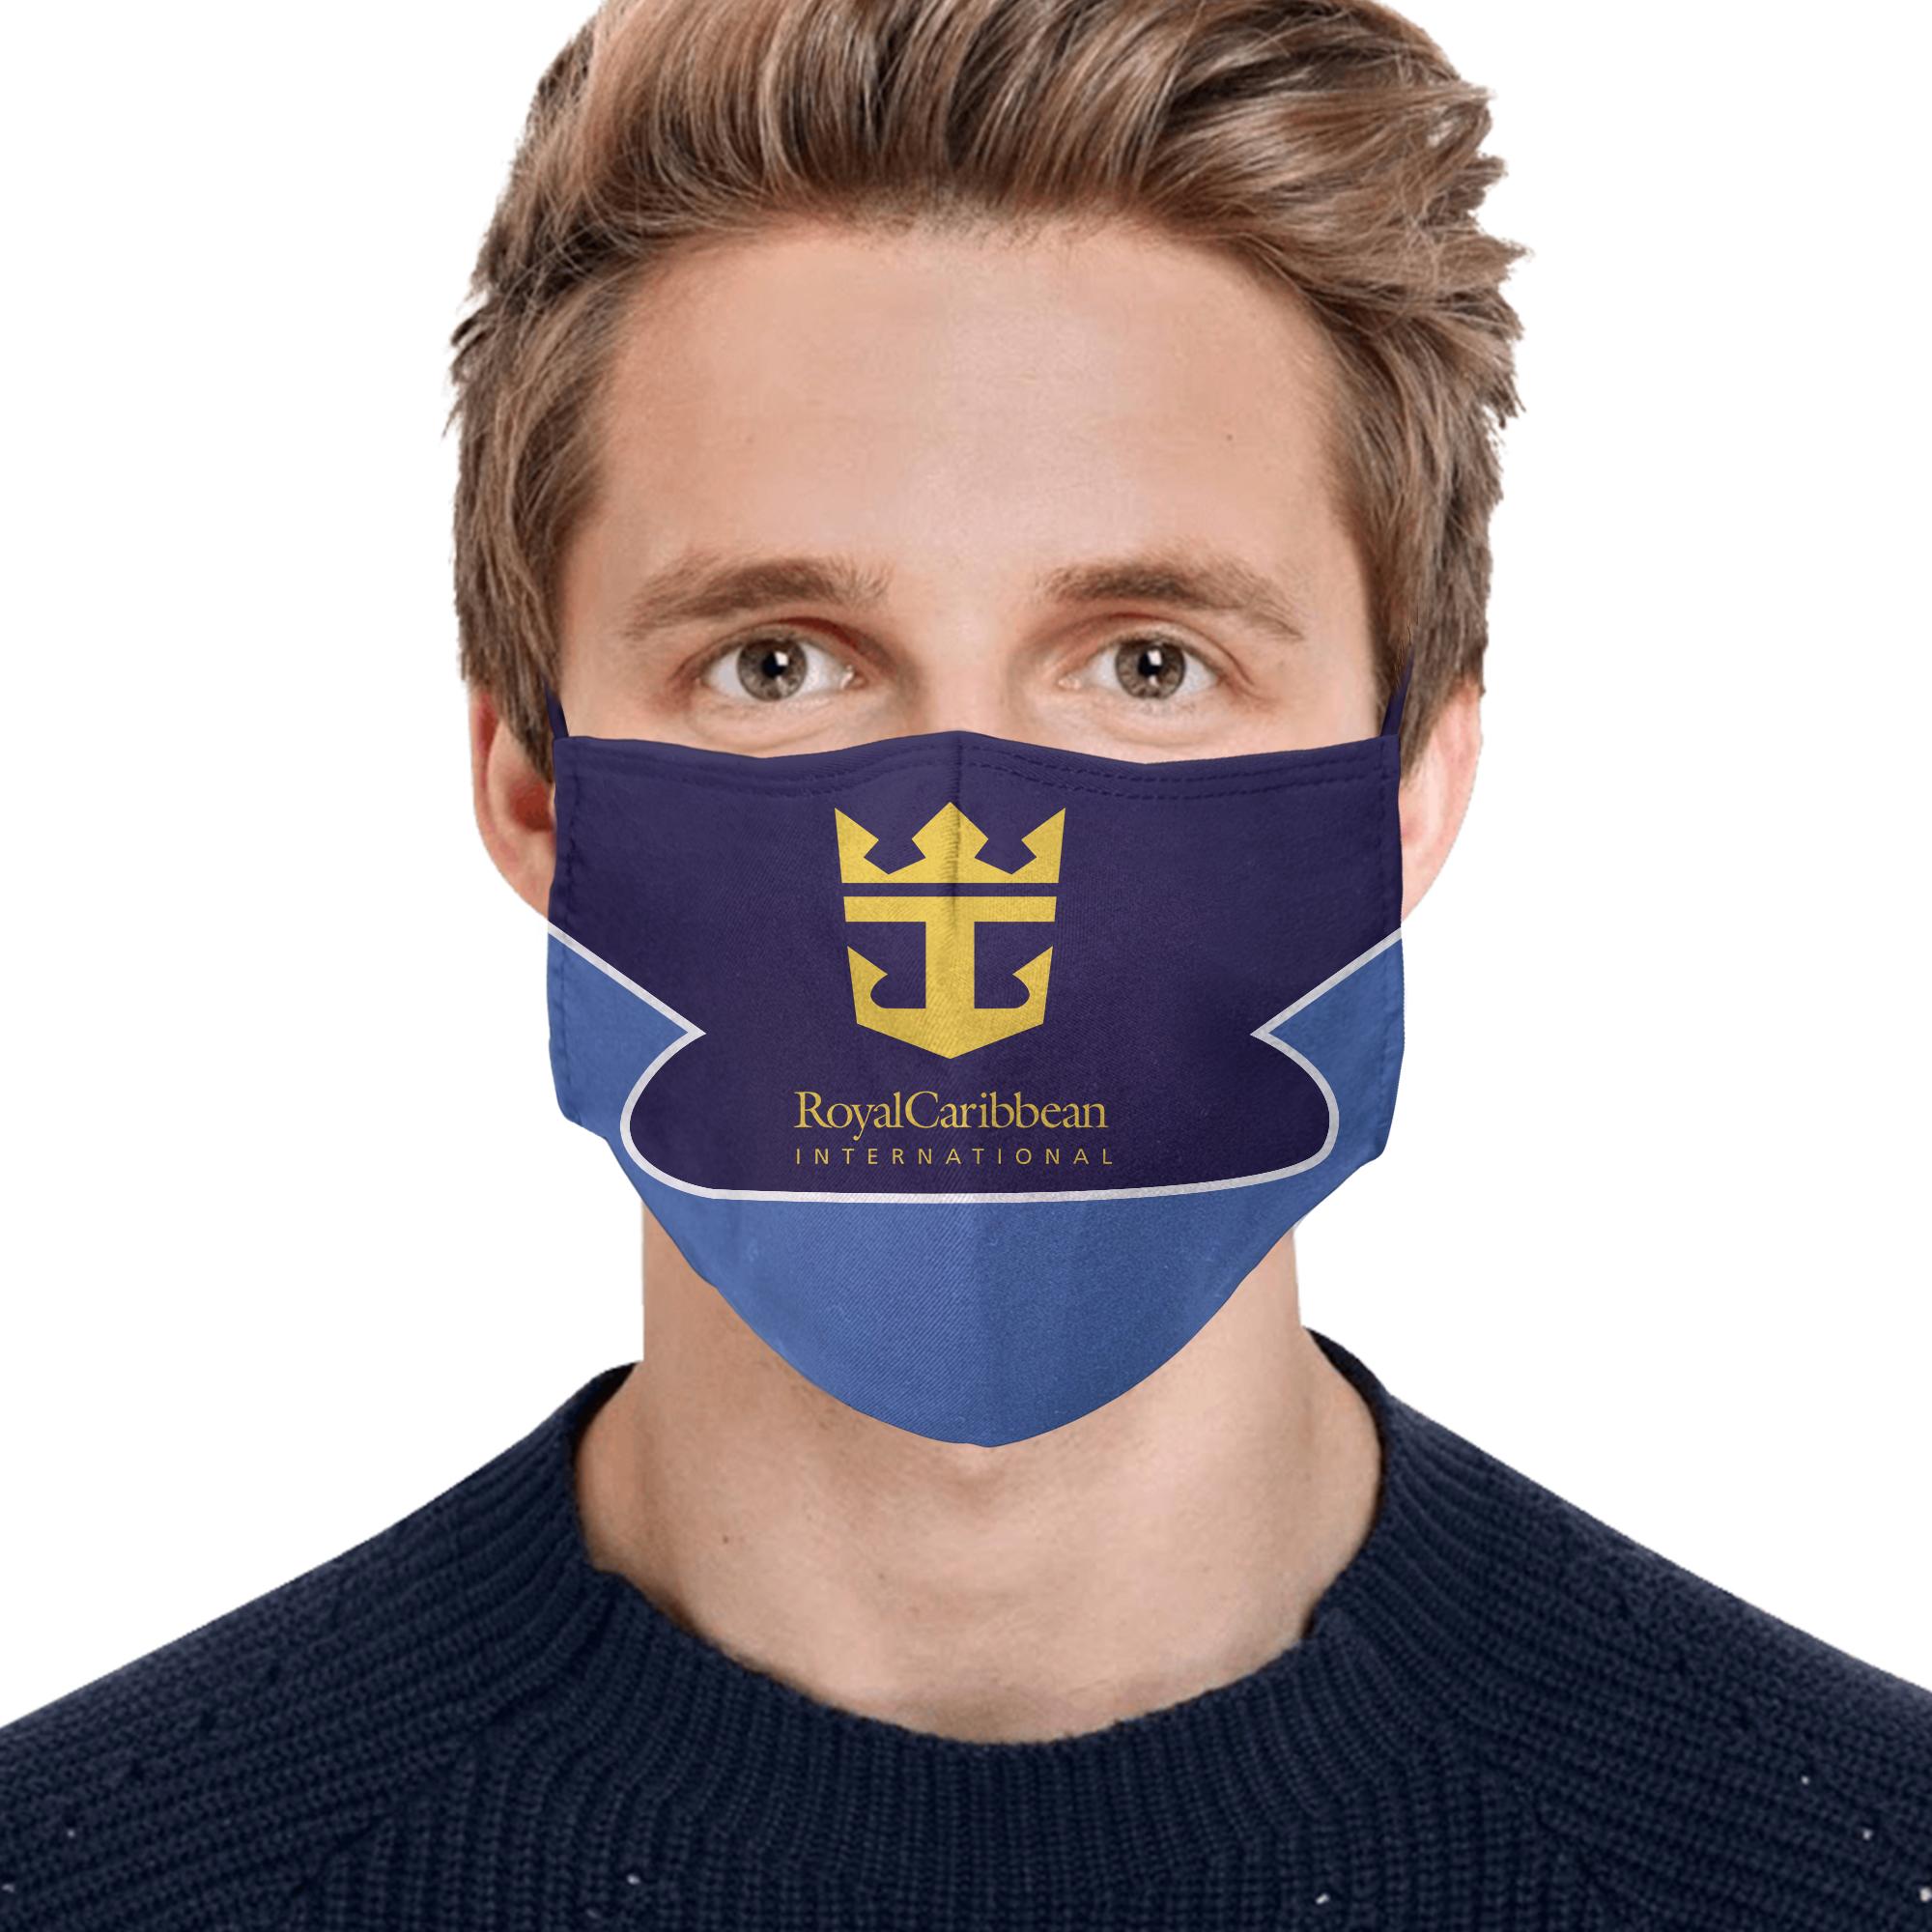 Royal caribbean international full printing face mask 3